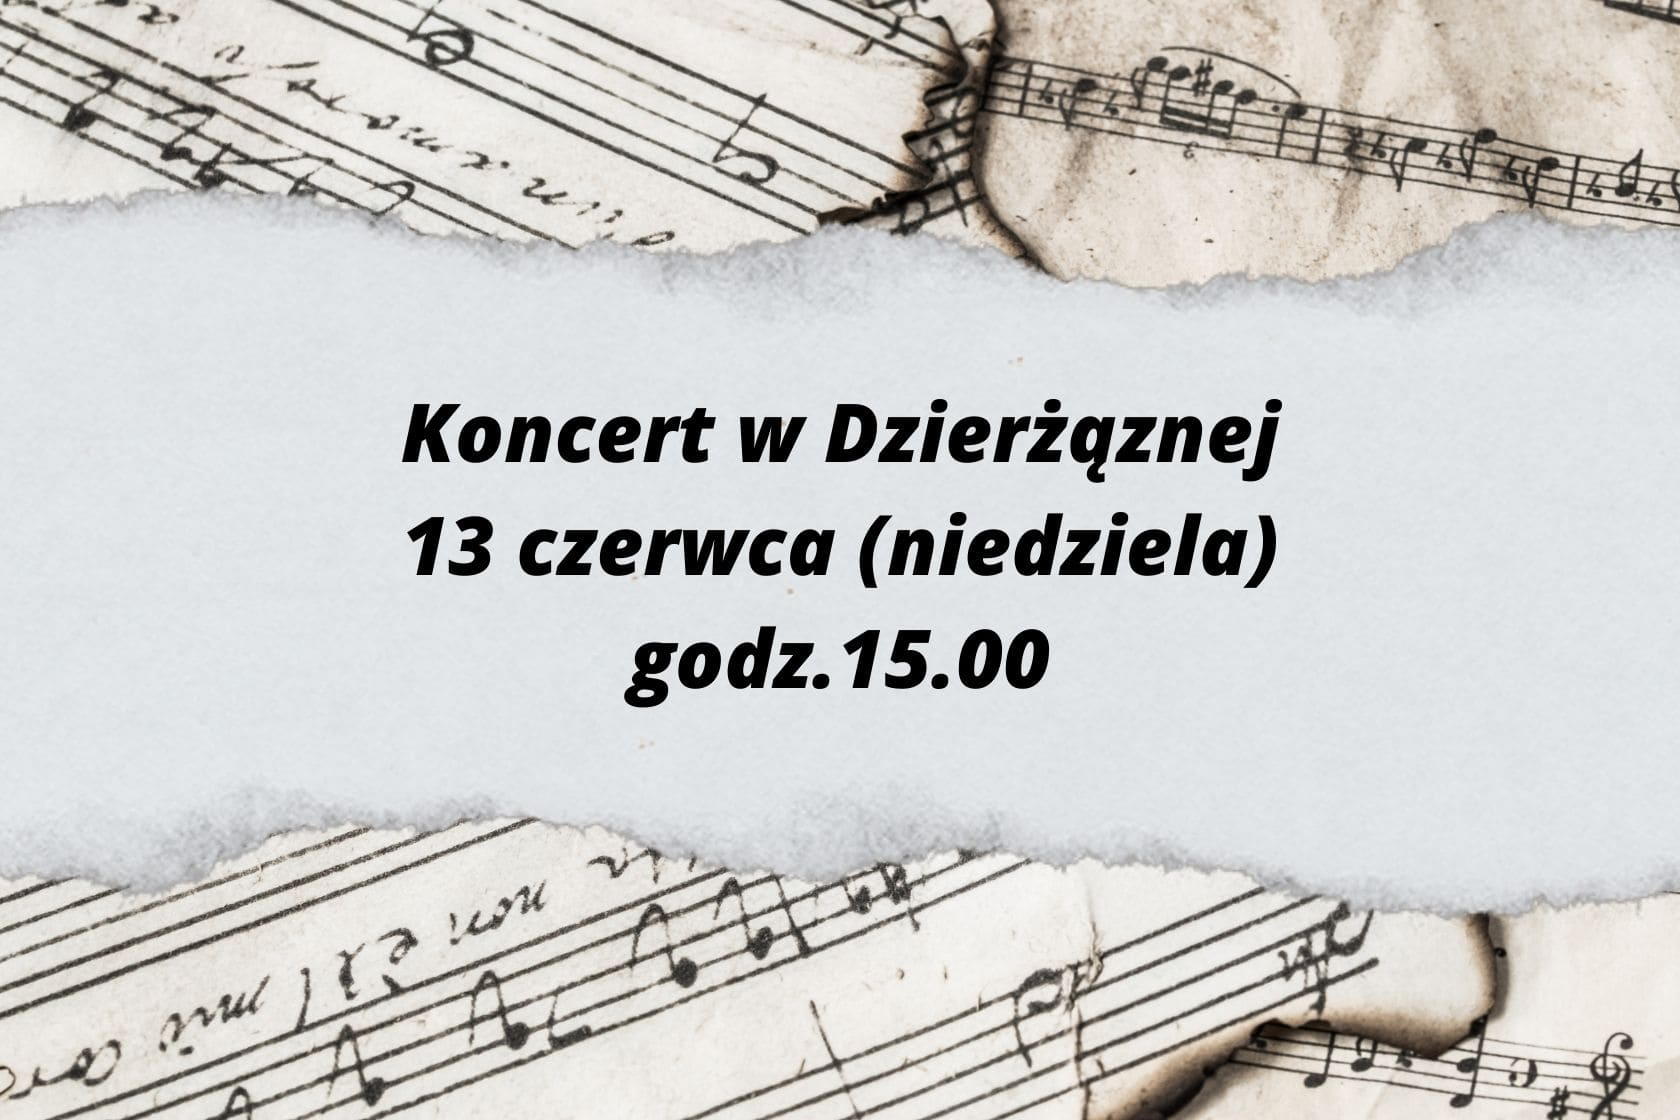 koncert, park dworski, fortepian, Agata Górska-Kołodziejska